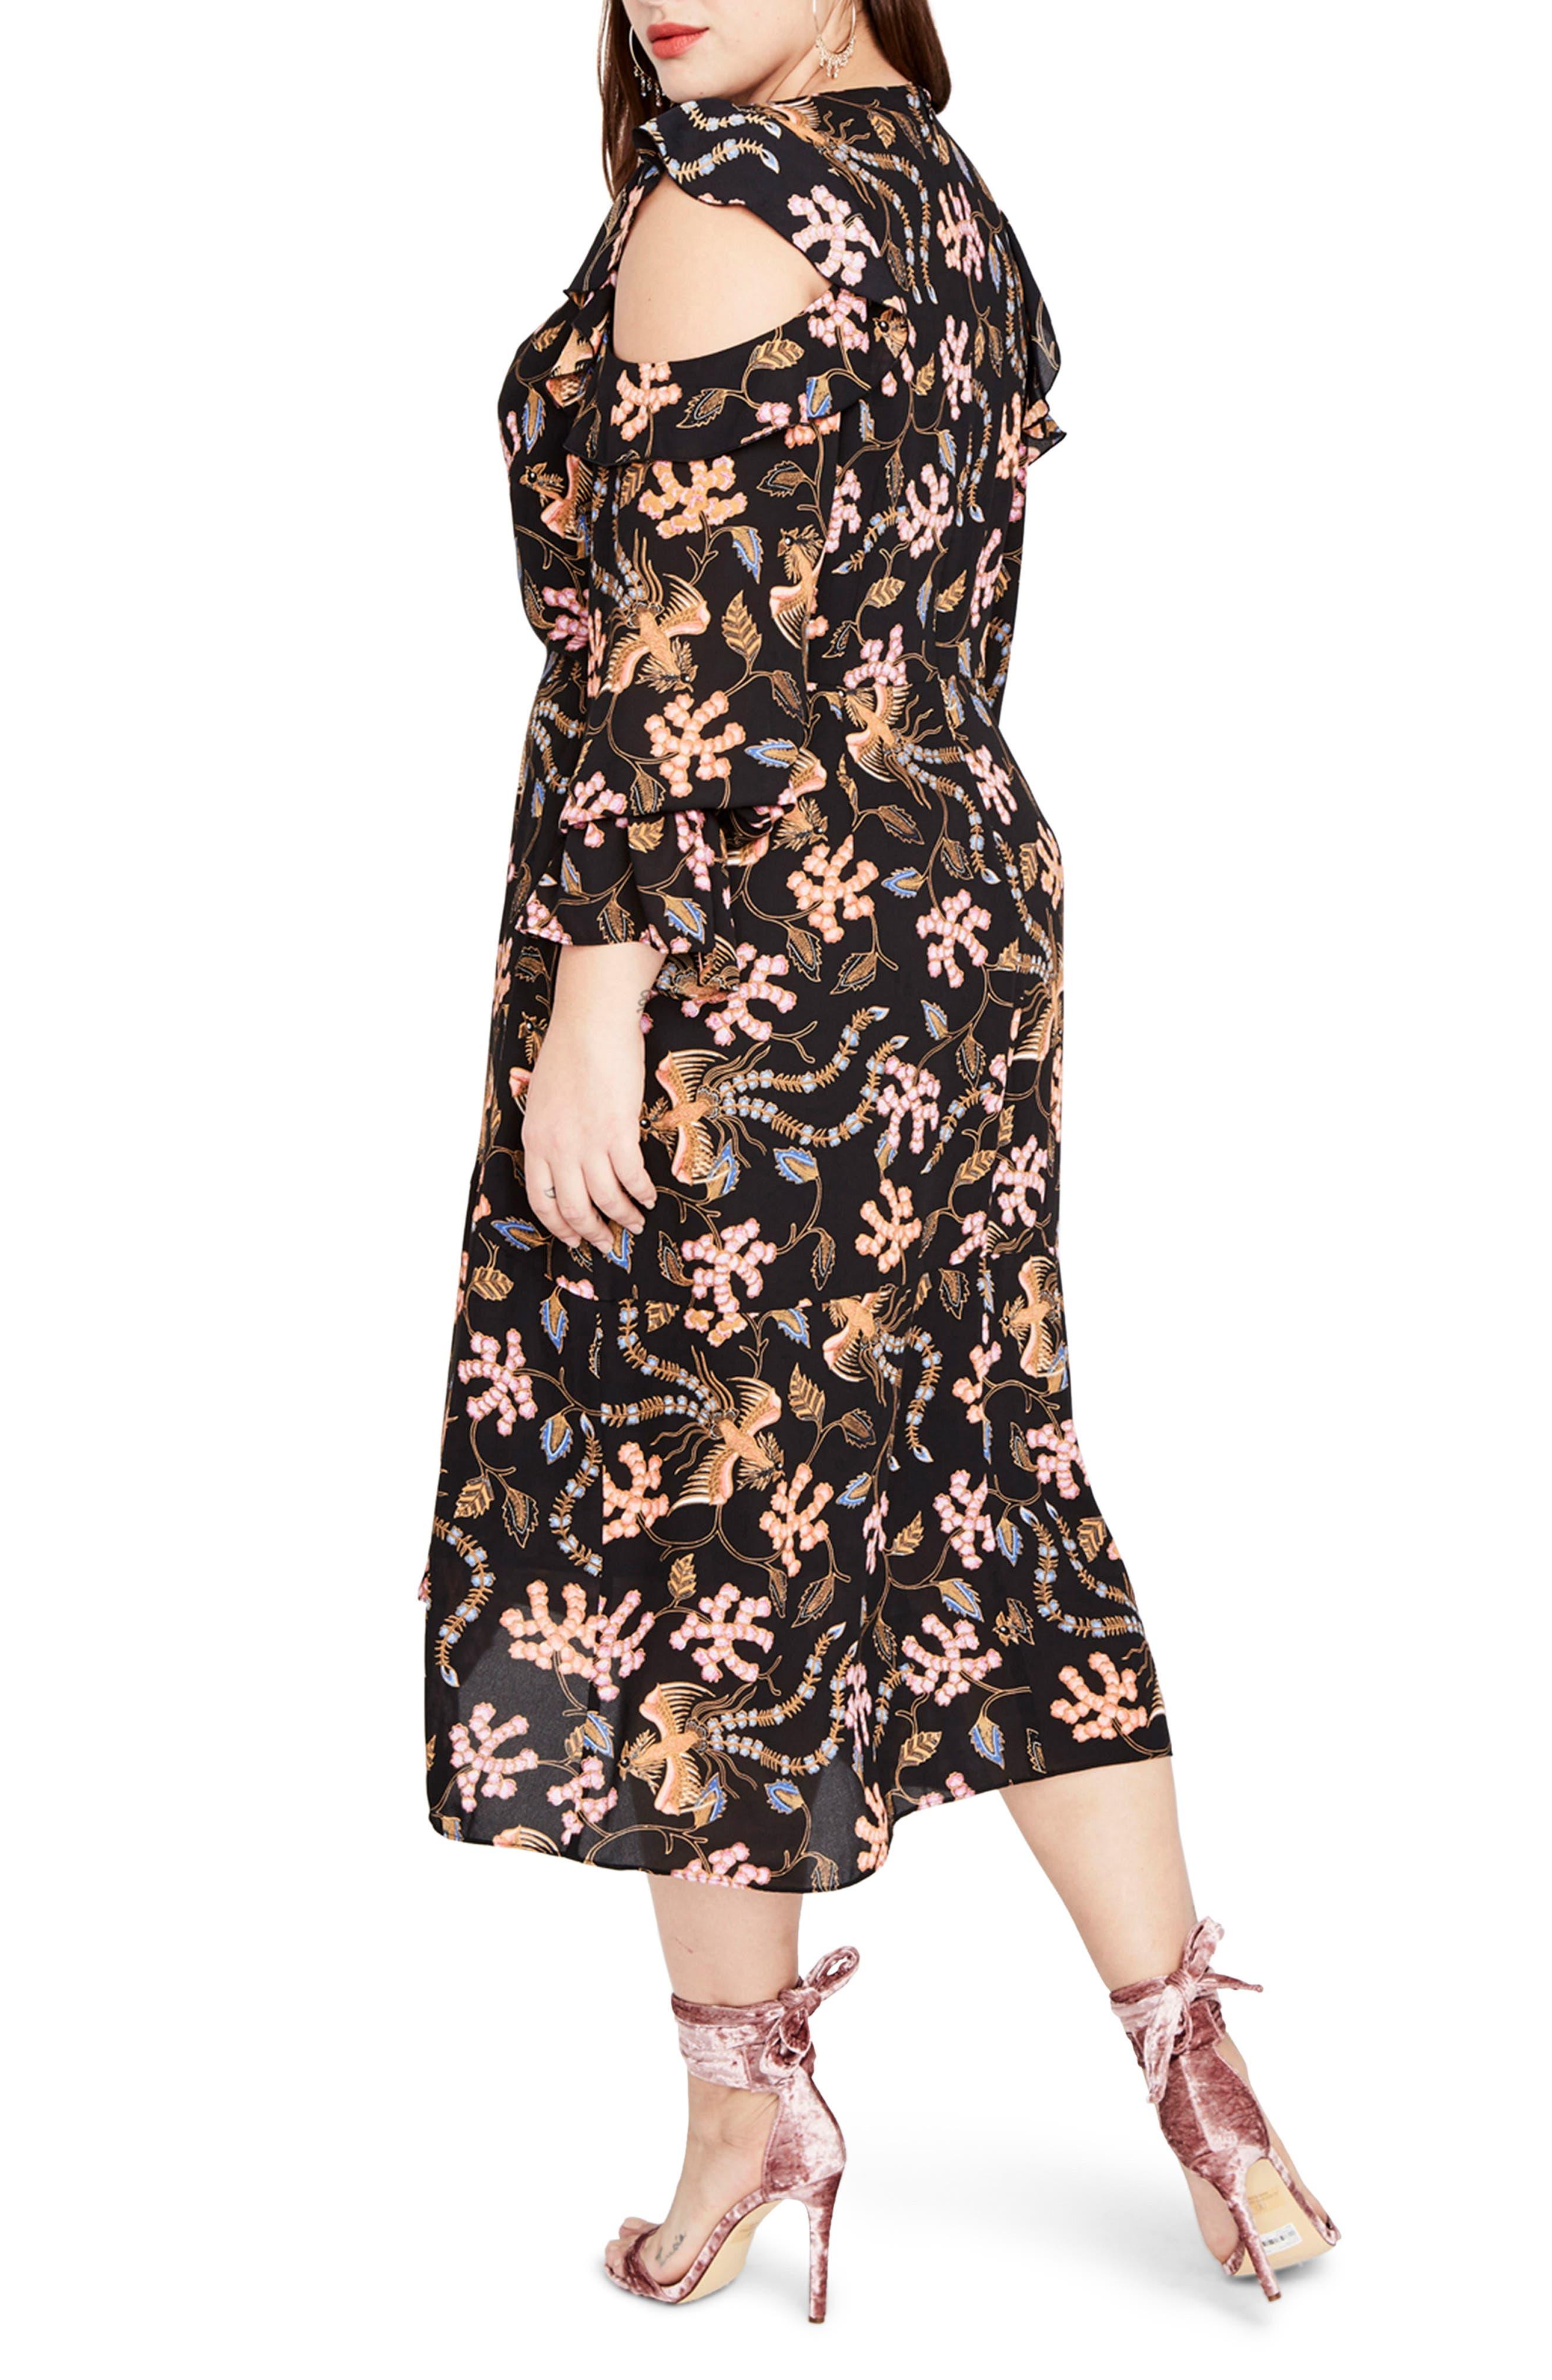 RACHEL BY Rachel Roy Cold Shoulder Ruffle Midi Dress,                             Alternate thumbnail 3, color,                             Black Multi